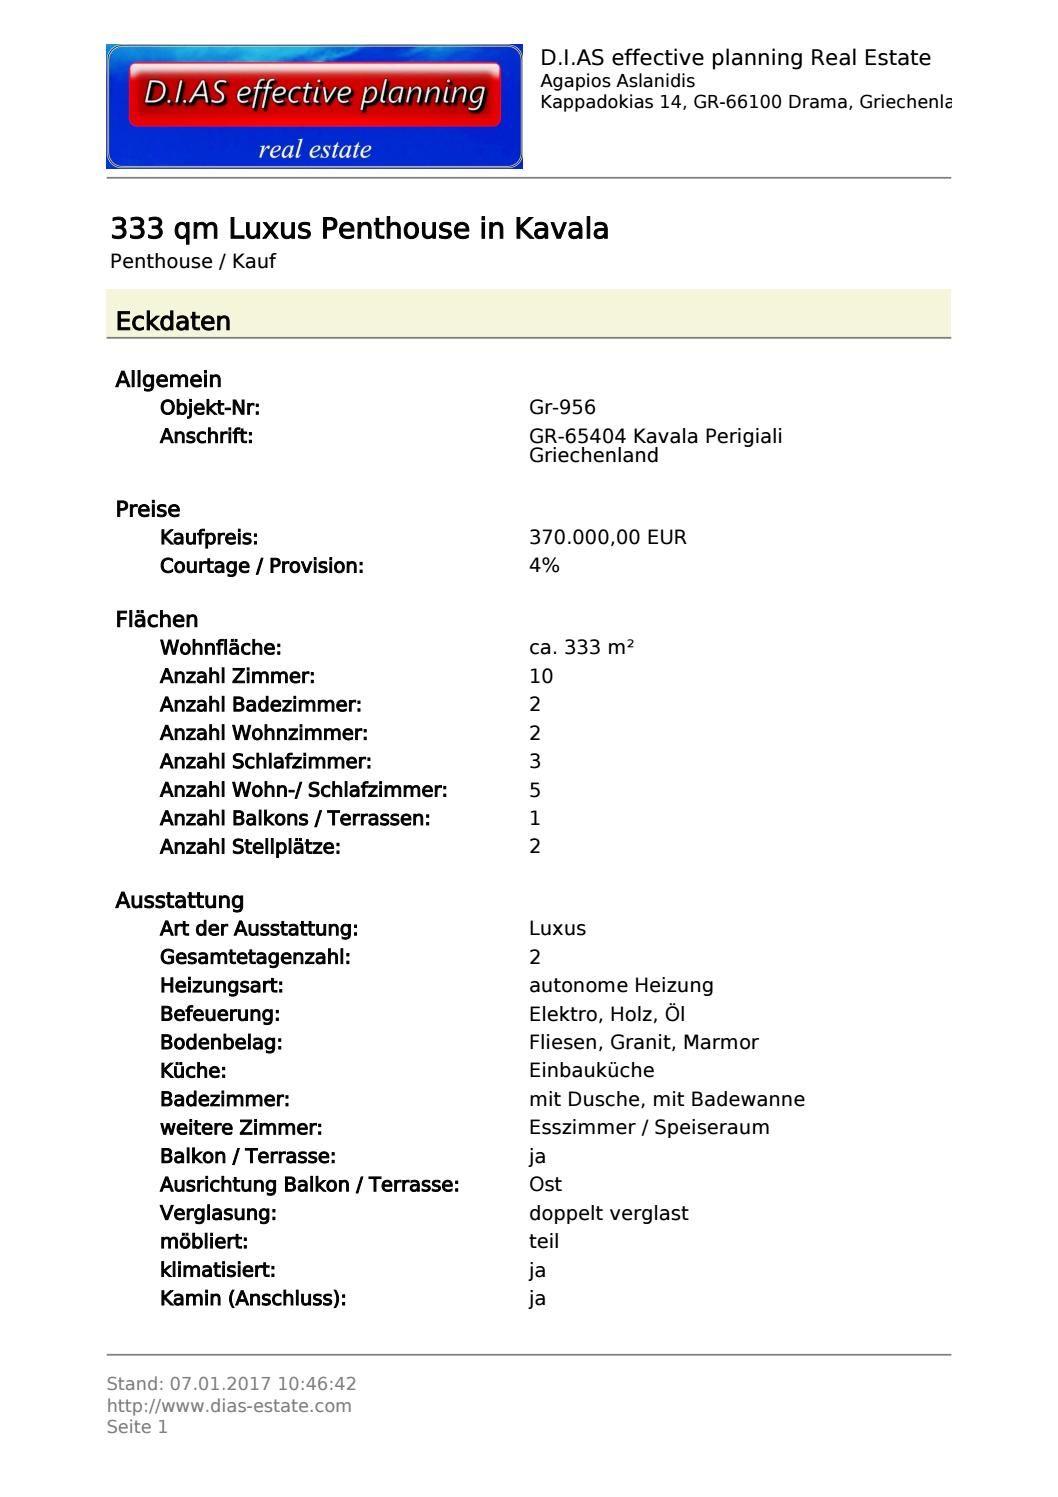 Luxus Penthouse Kavala Gr 956